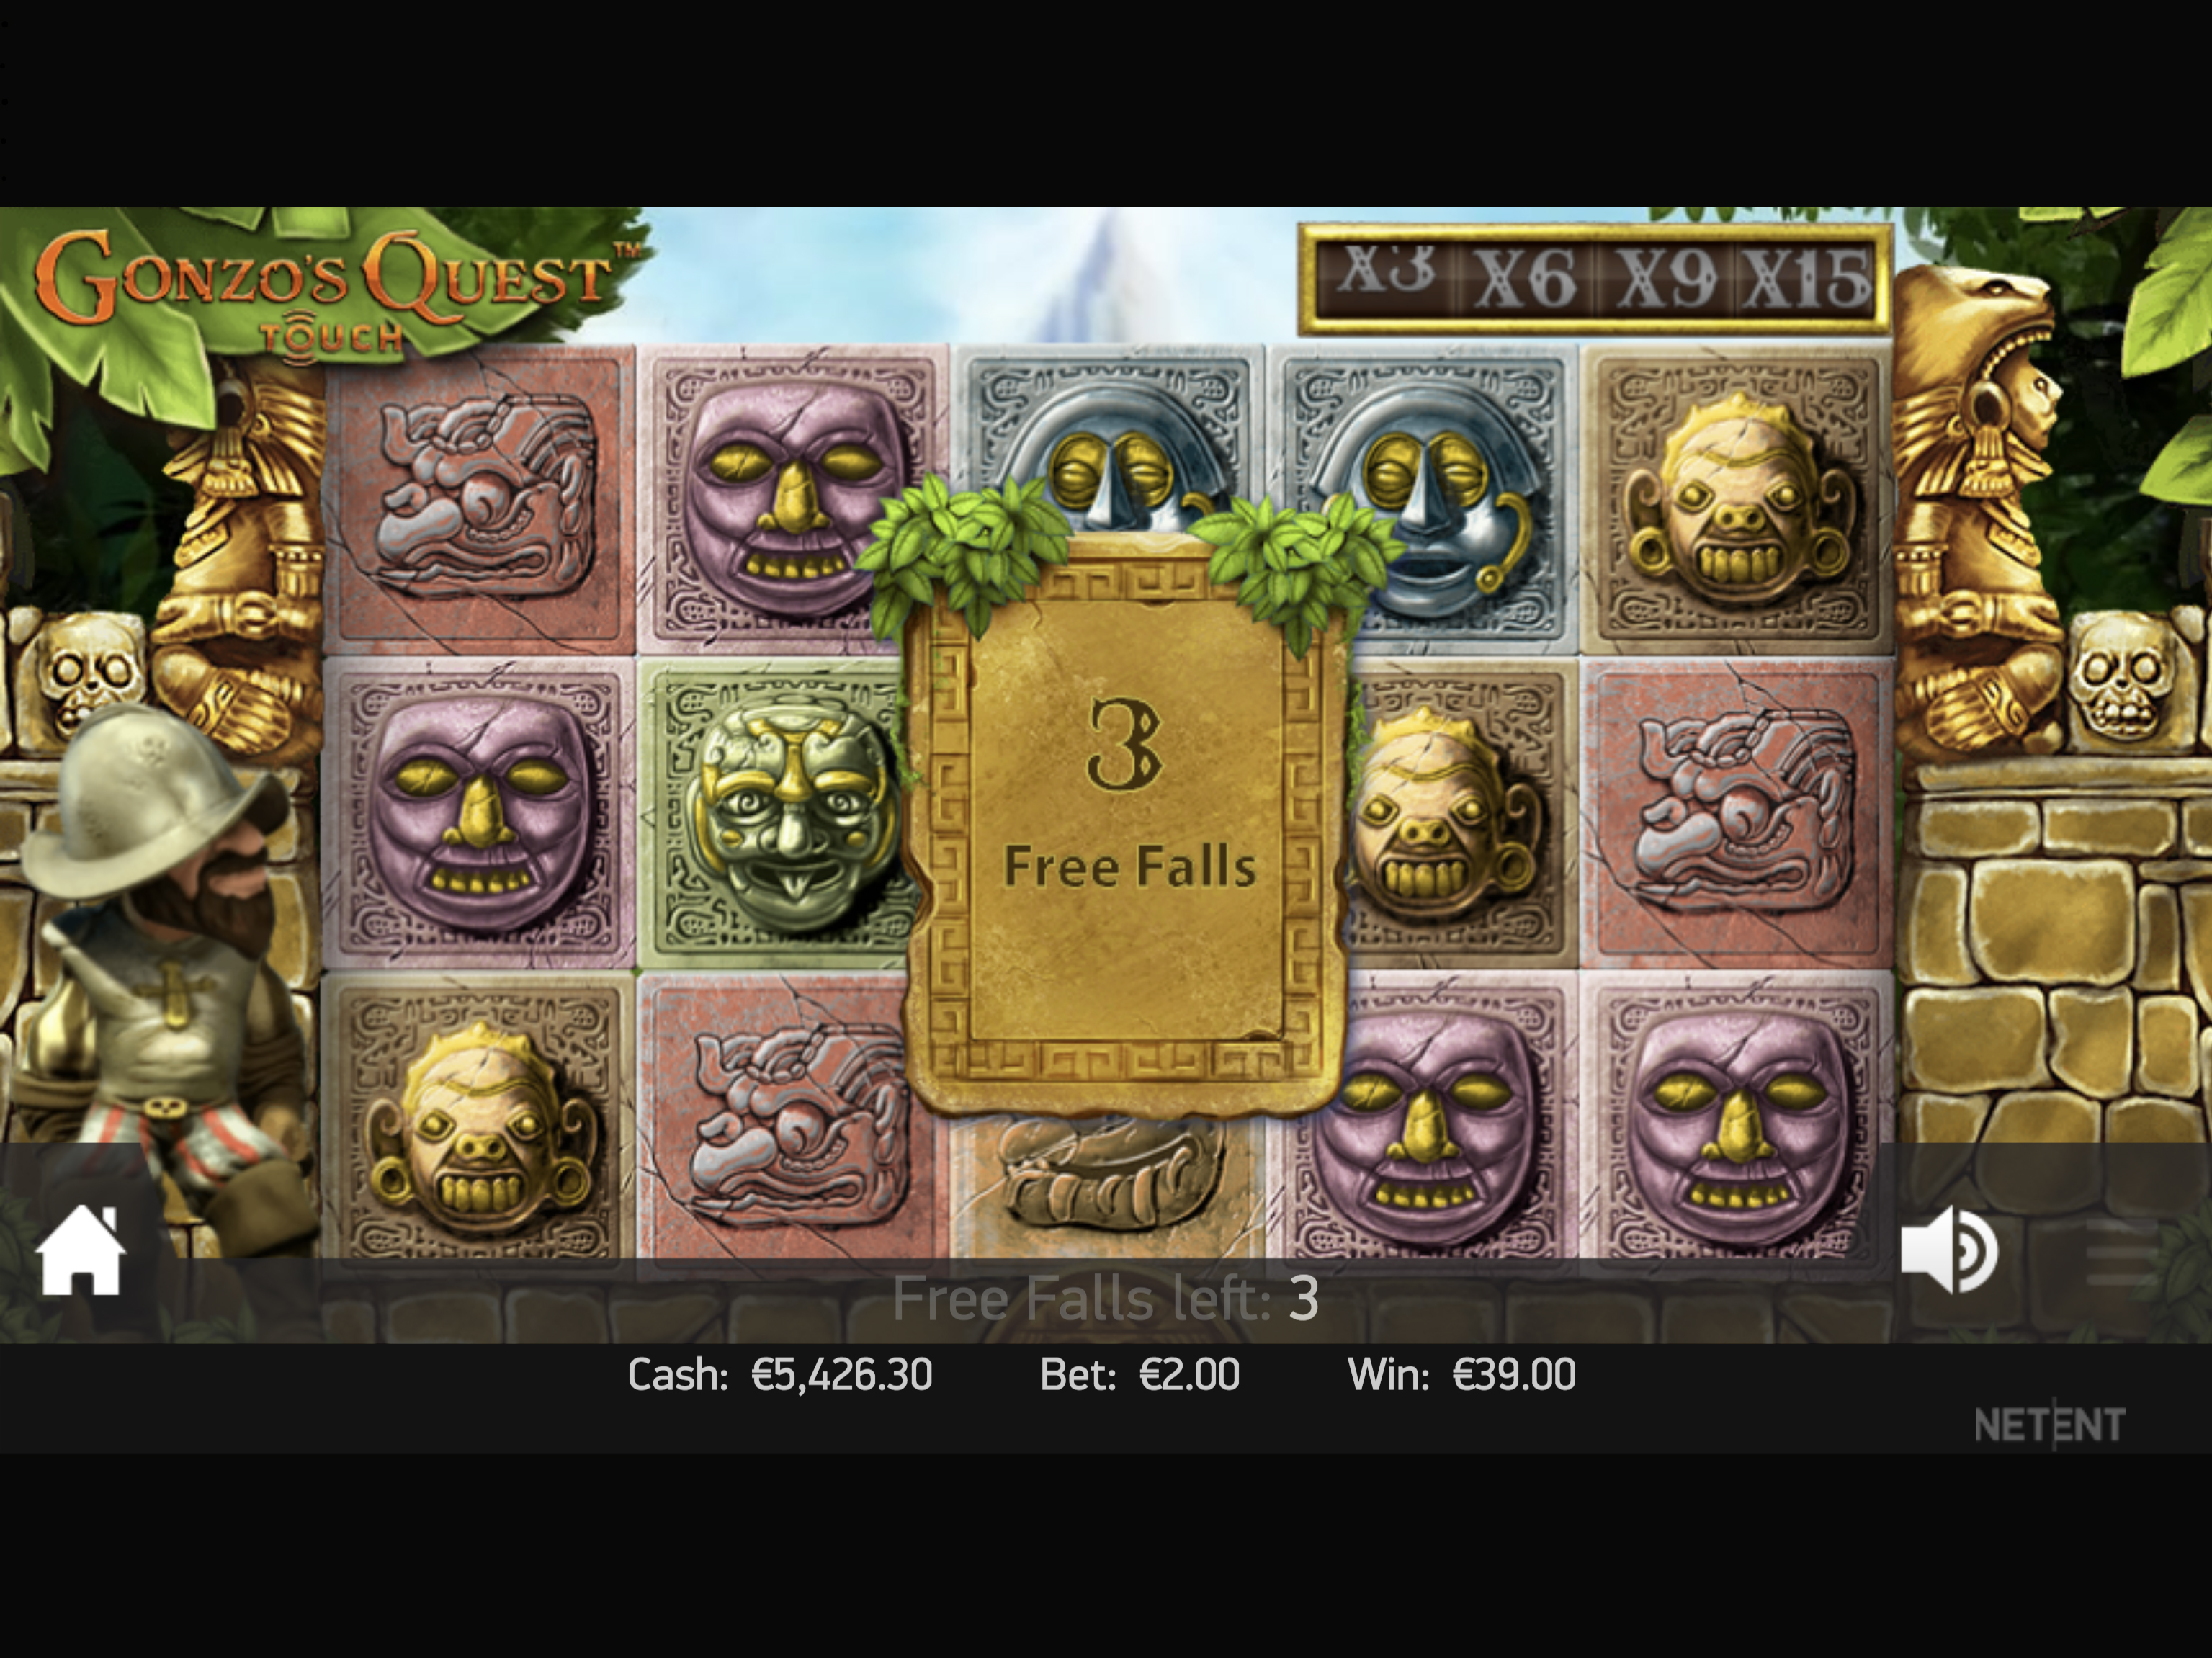 Gonzo's Quest Free Falls